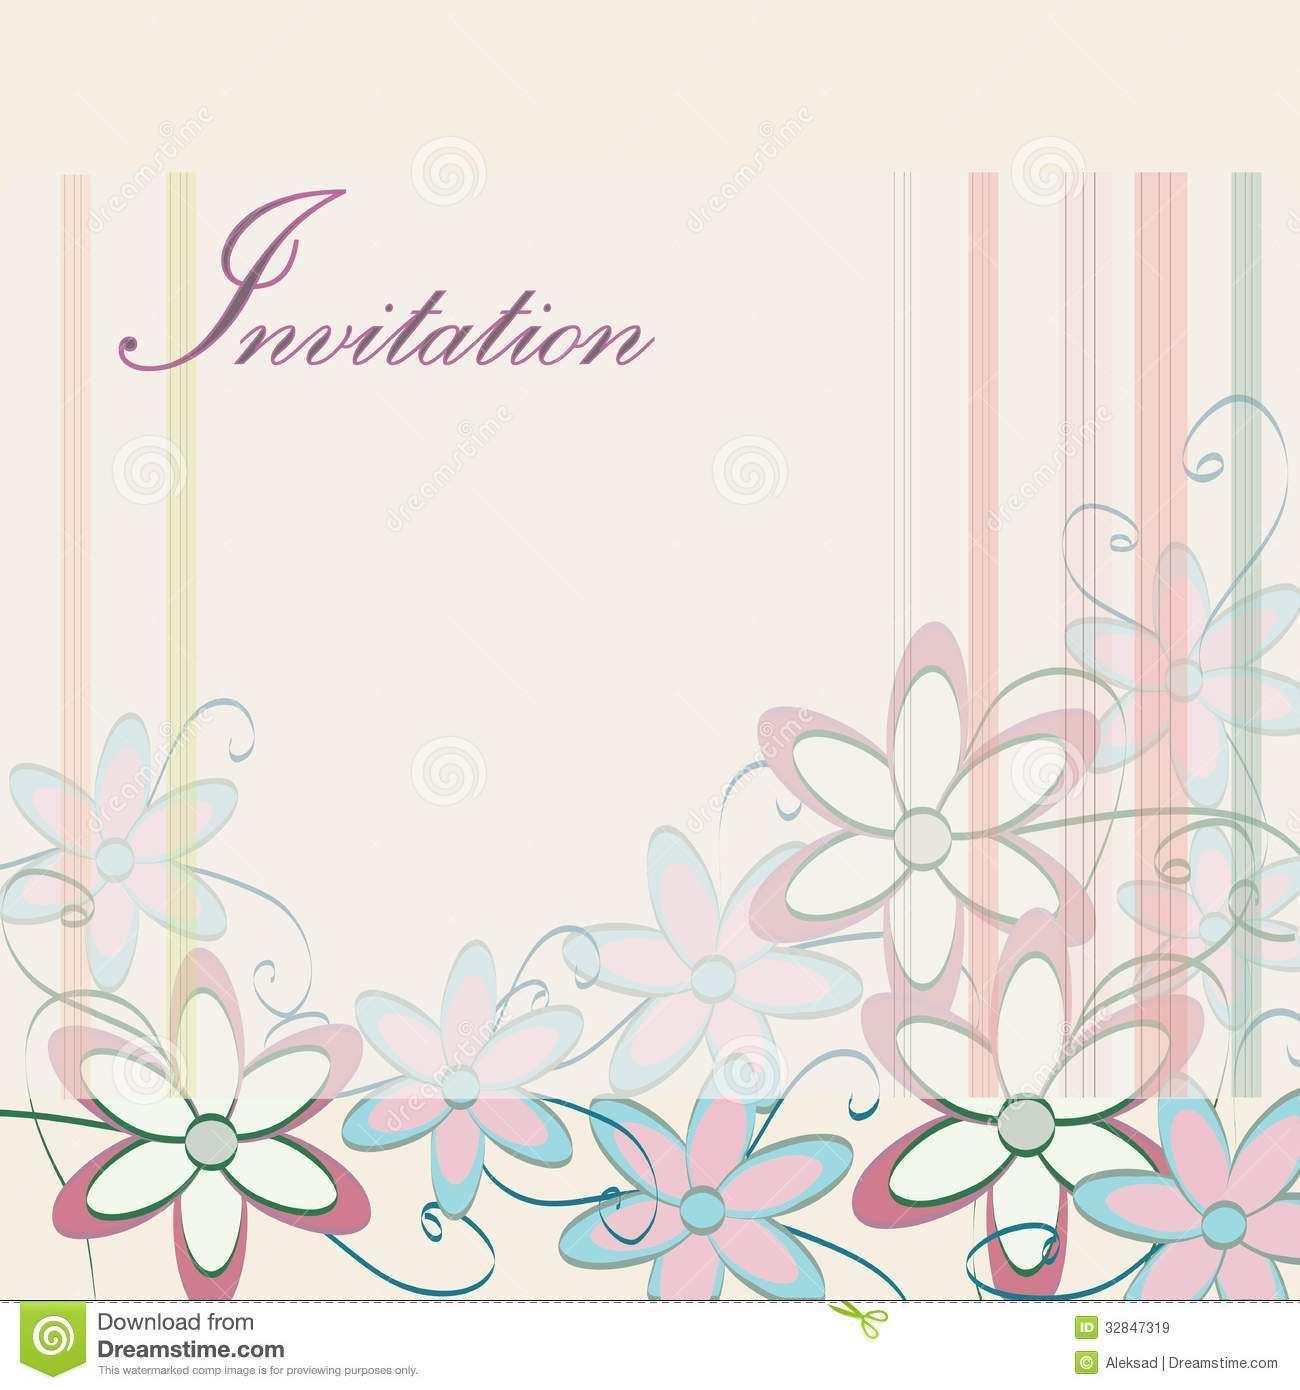 77 Free Blank Invitation Card Template Psd Formating for Blank Invitation Card Template Psd